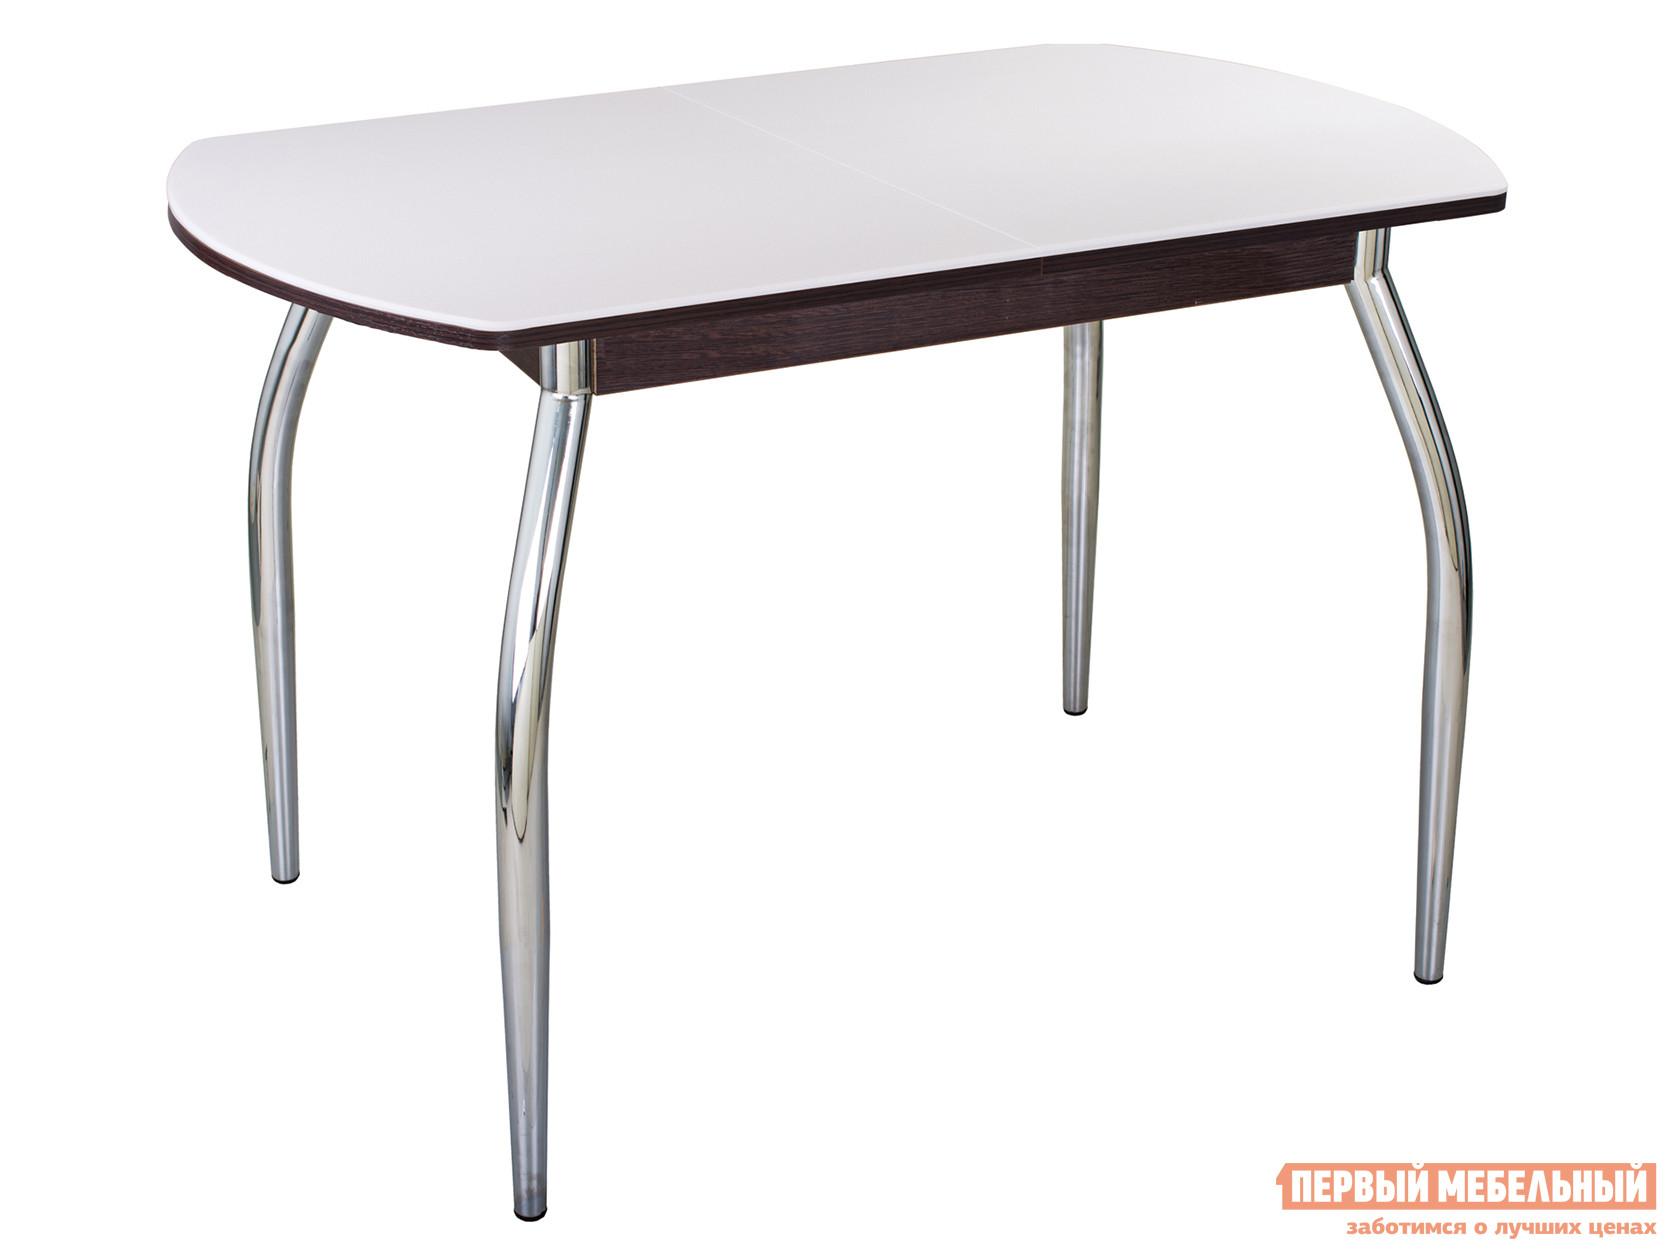 цена на Обеденный стол Домотека Обеденный стол Румба ПО КМ